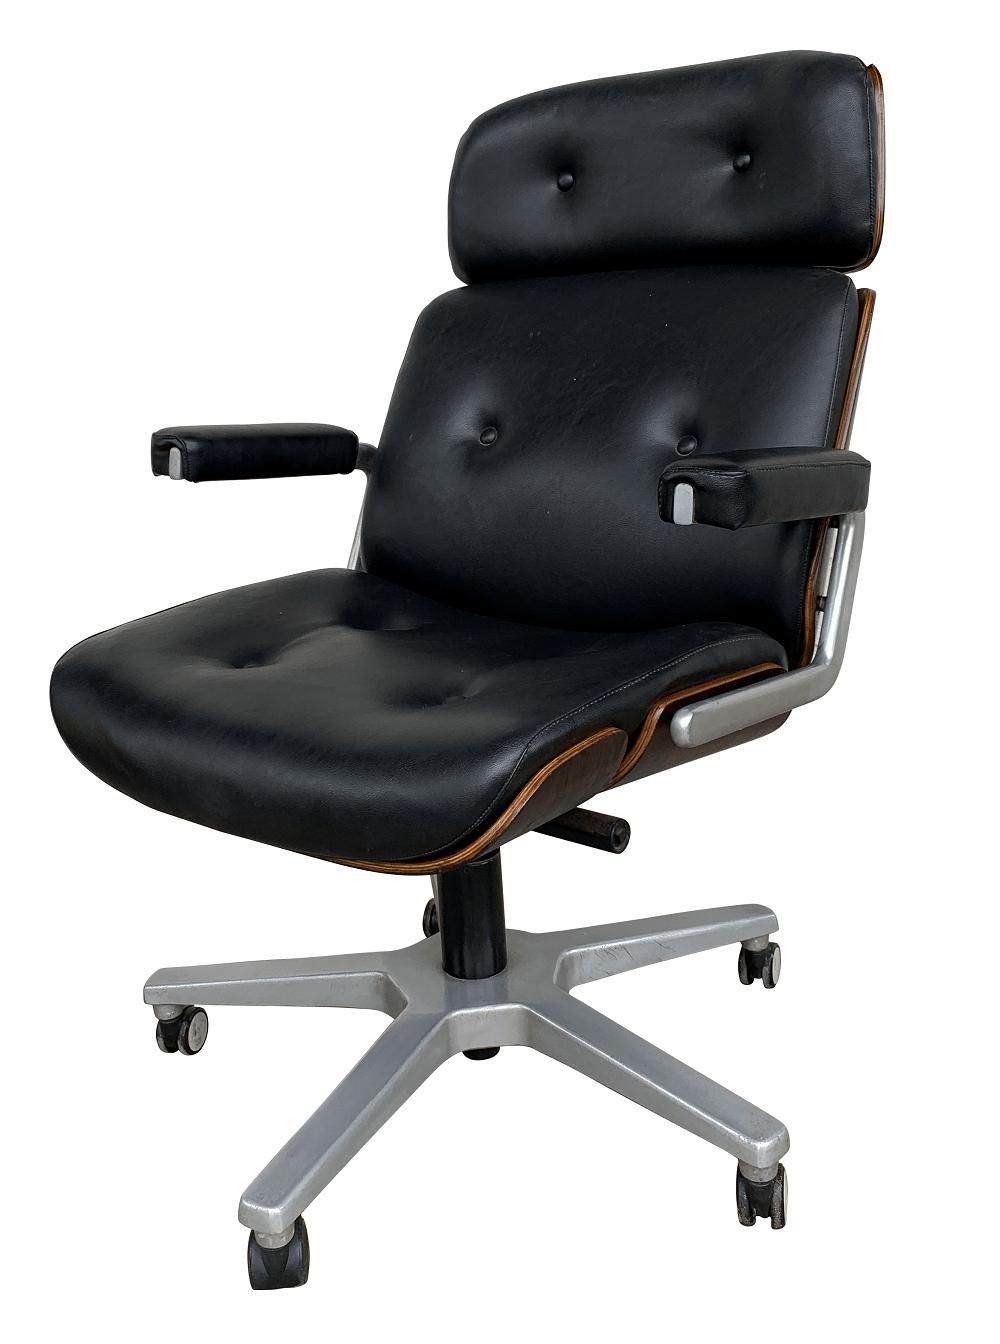 Cadeira Escritorio Giratoria Usada Charles Eames Madeira